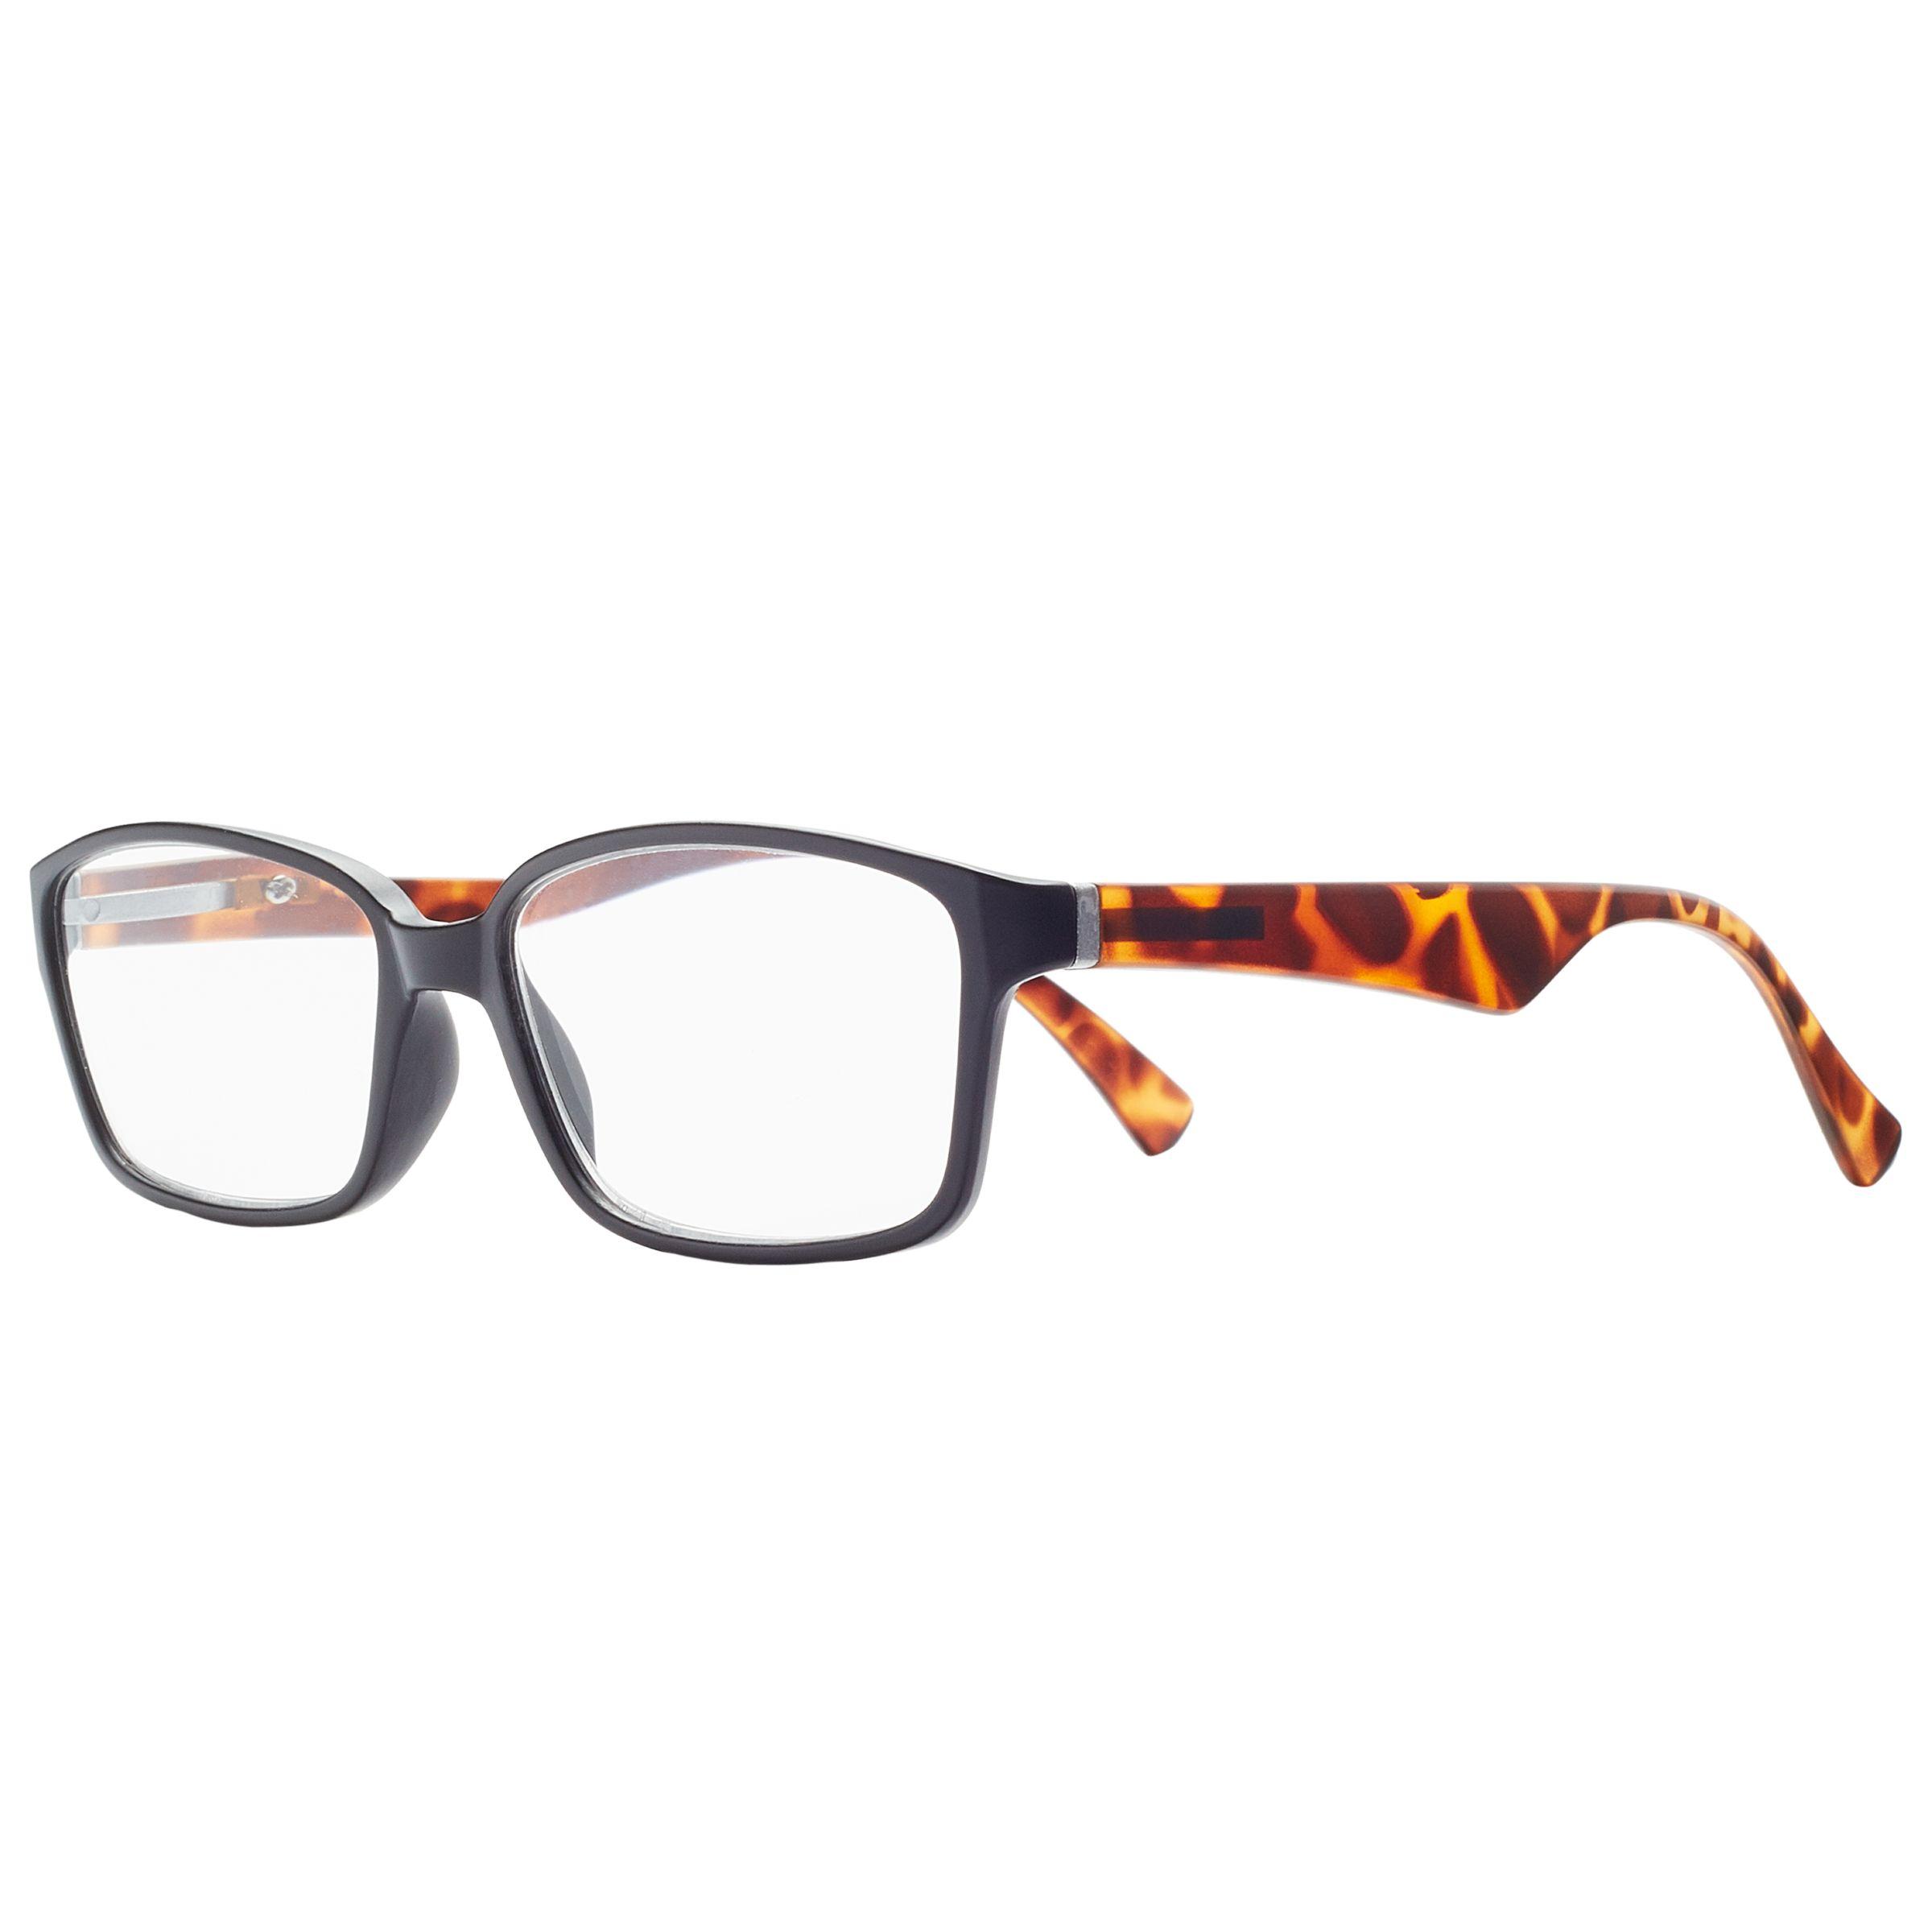 Magnif Eyes Magnif Eyes Unisex Ready Readers Olympia Glasses, Tortoise